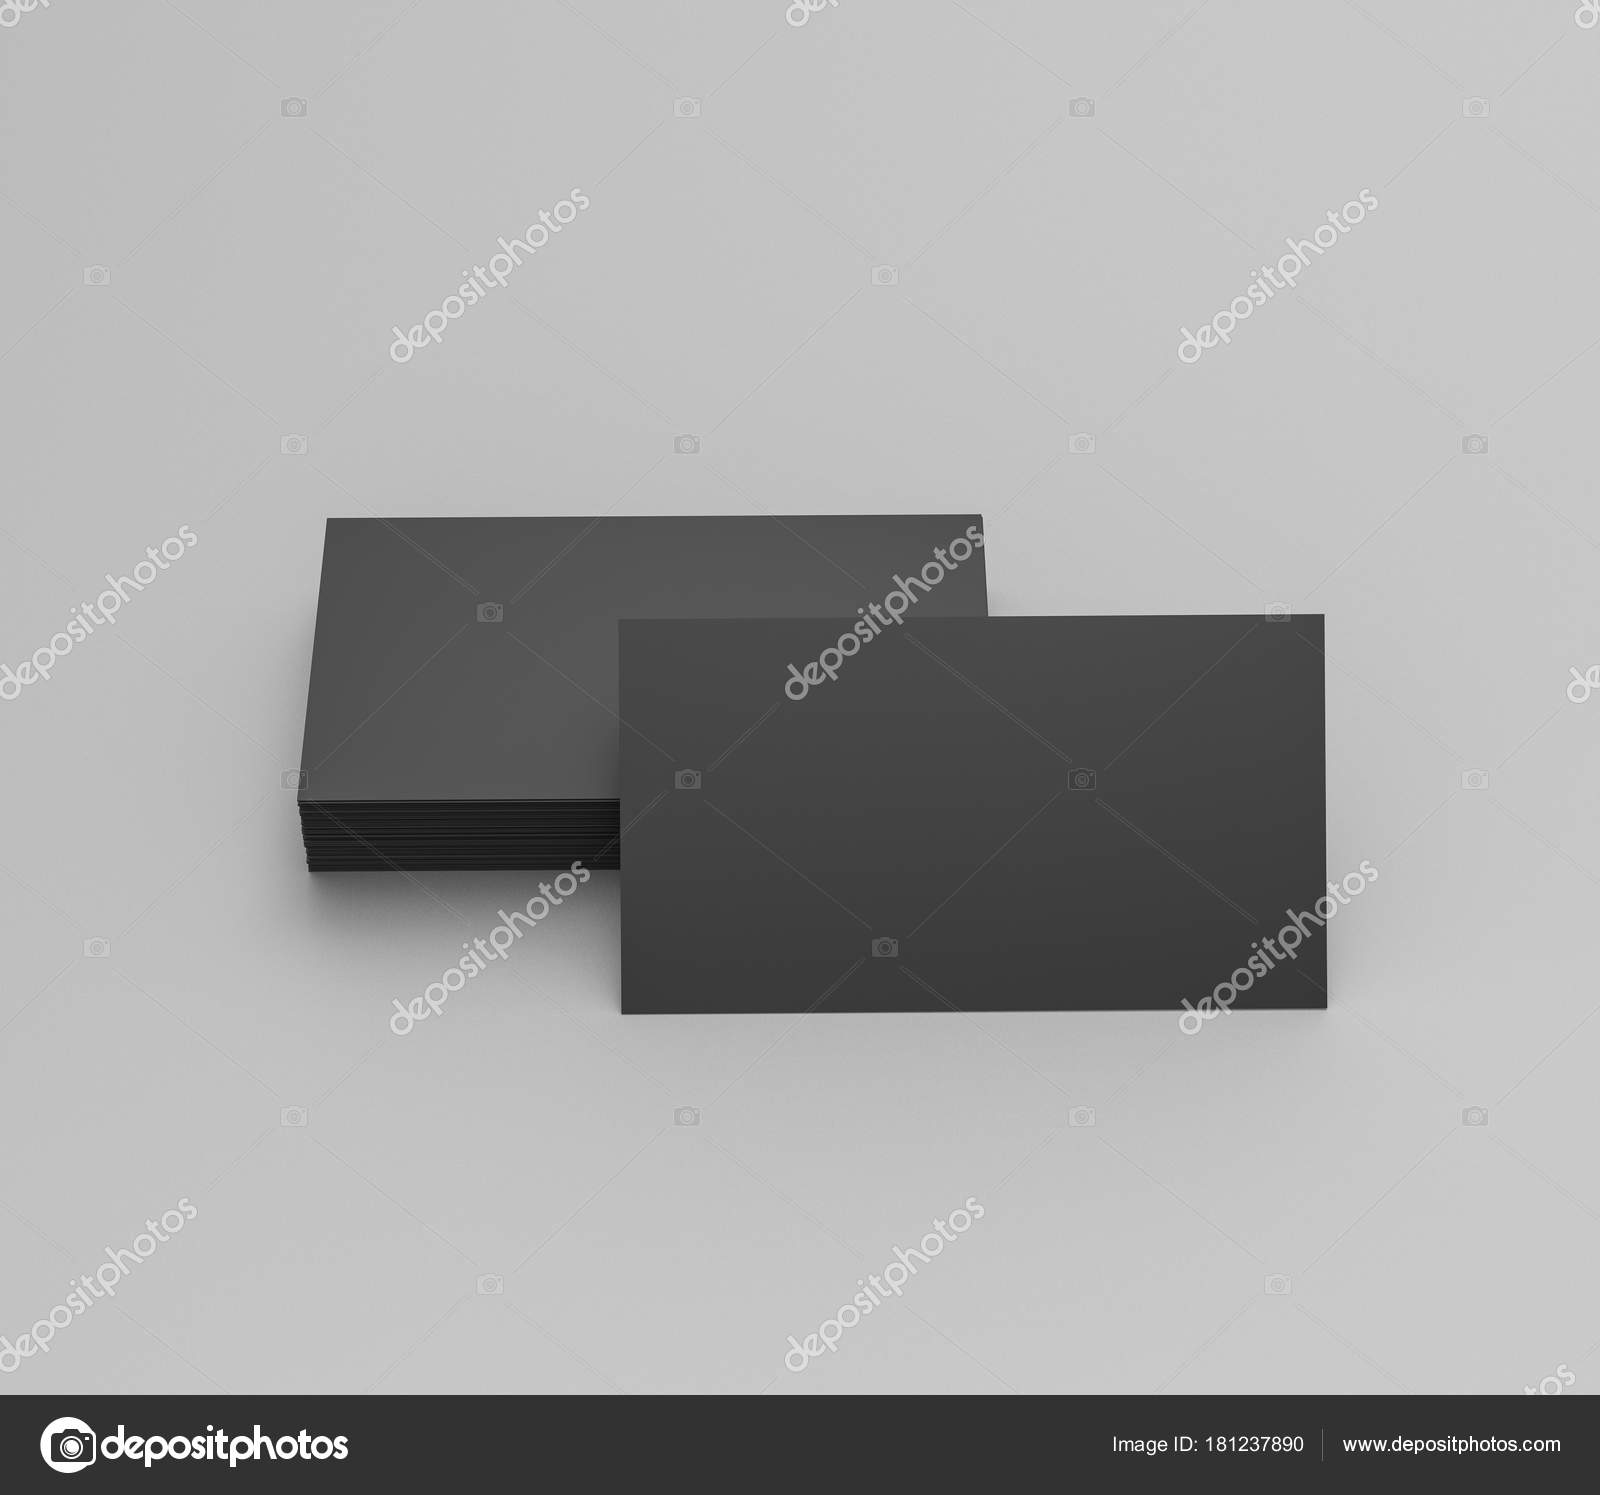 Black business cards blank mockup template 3d rendering stock black business cards blank mockup template 3d rendering stock photo colourmoves